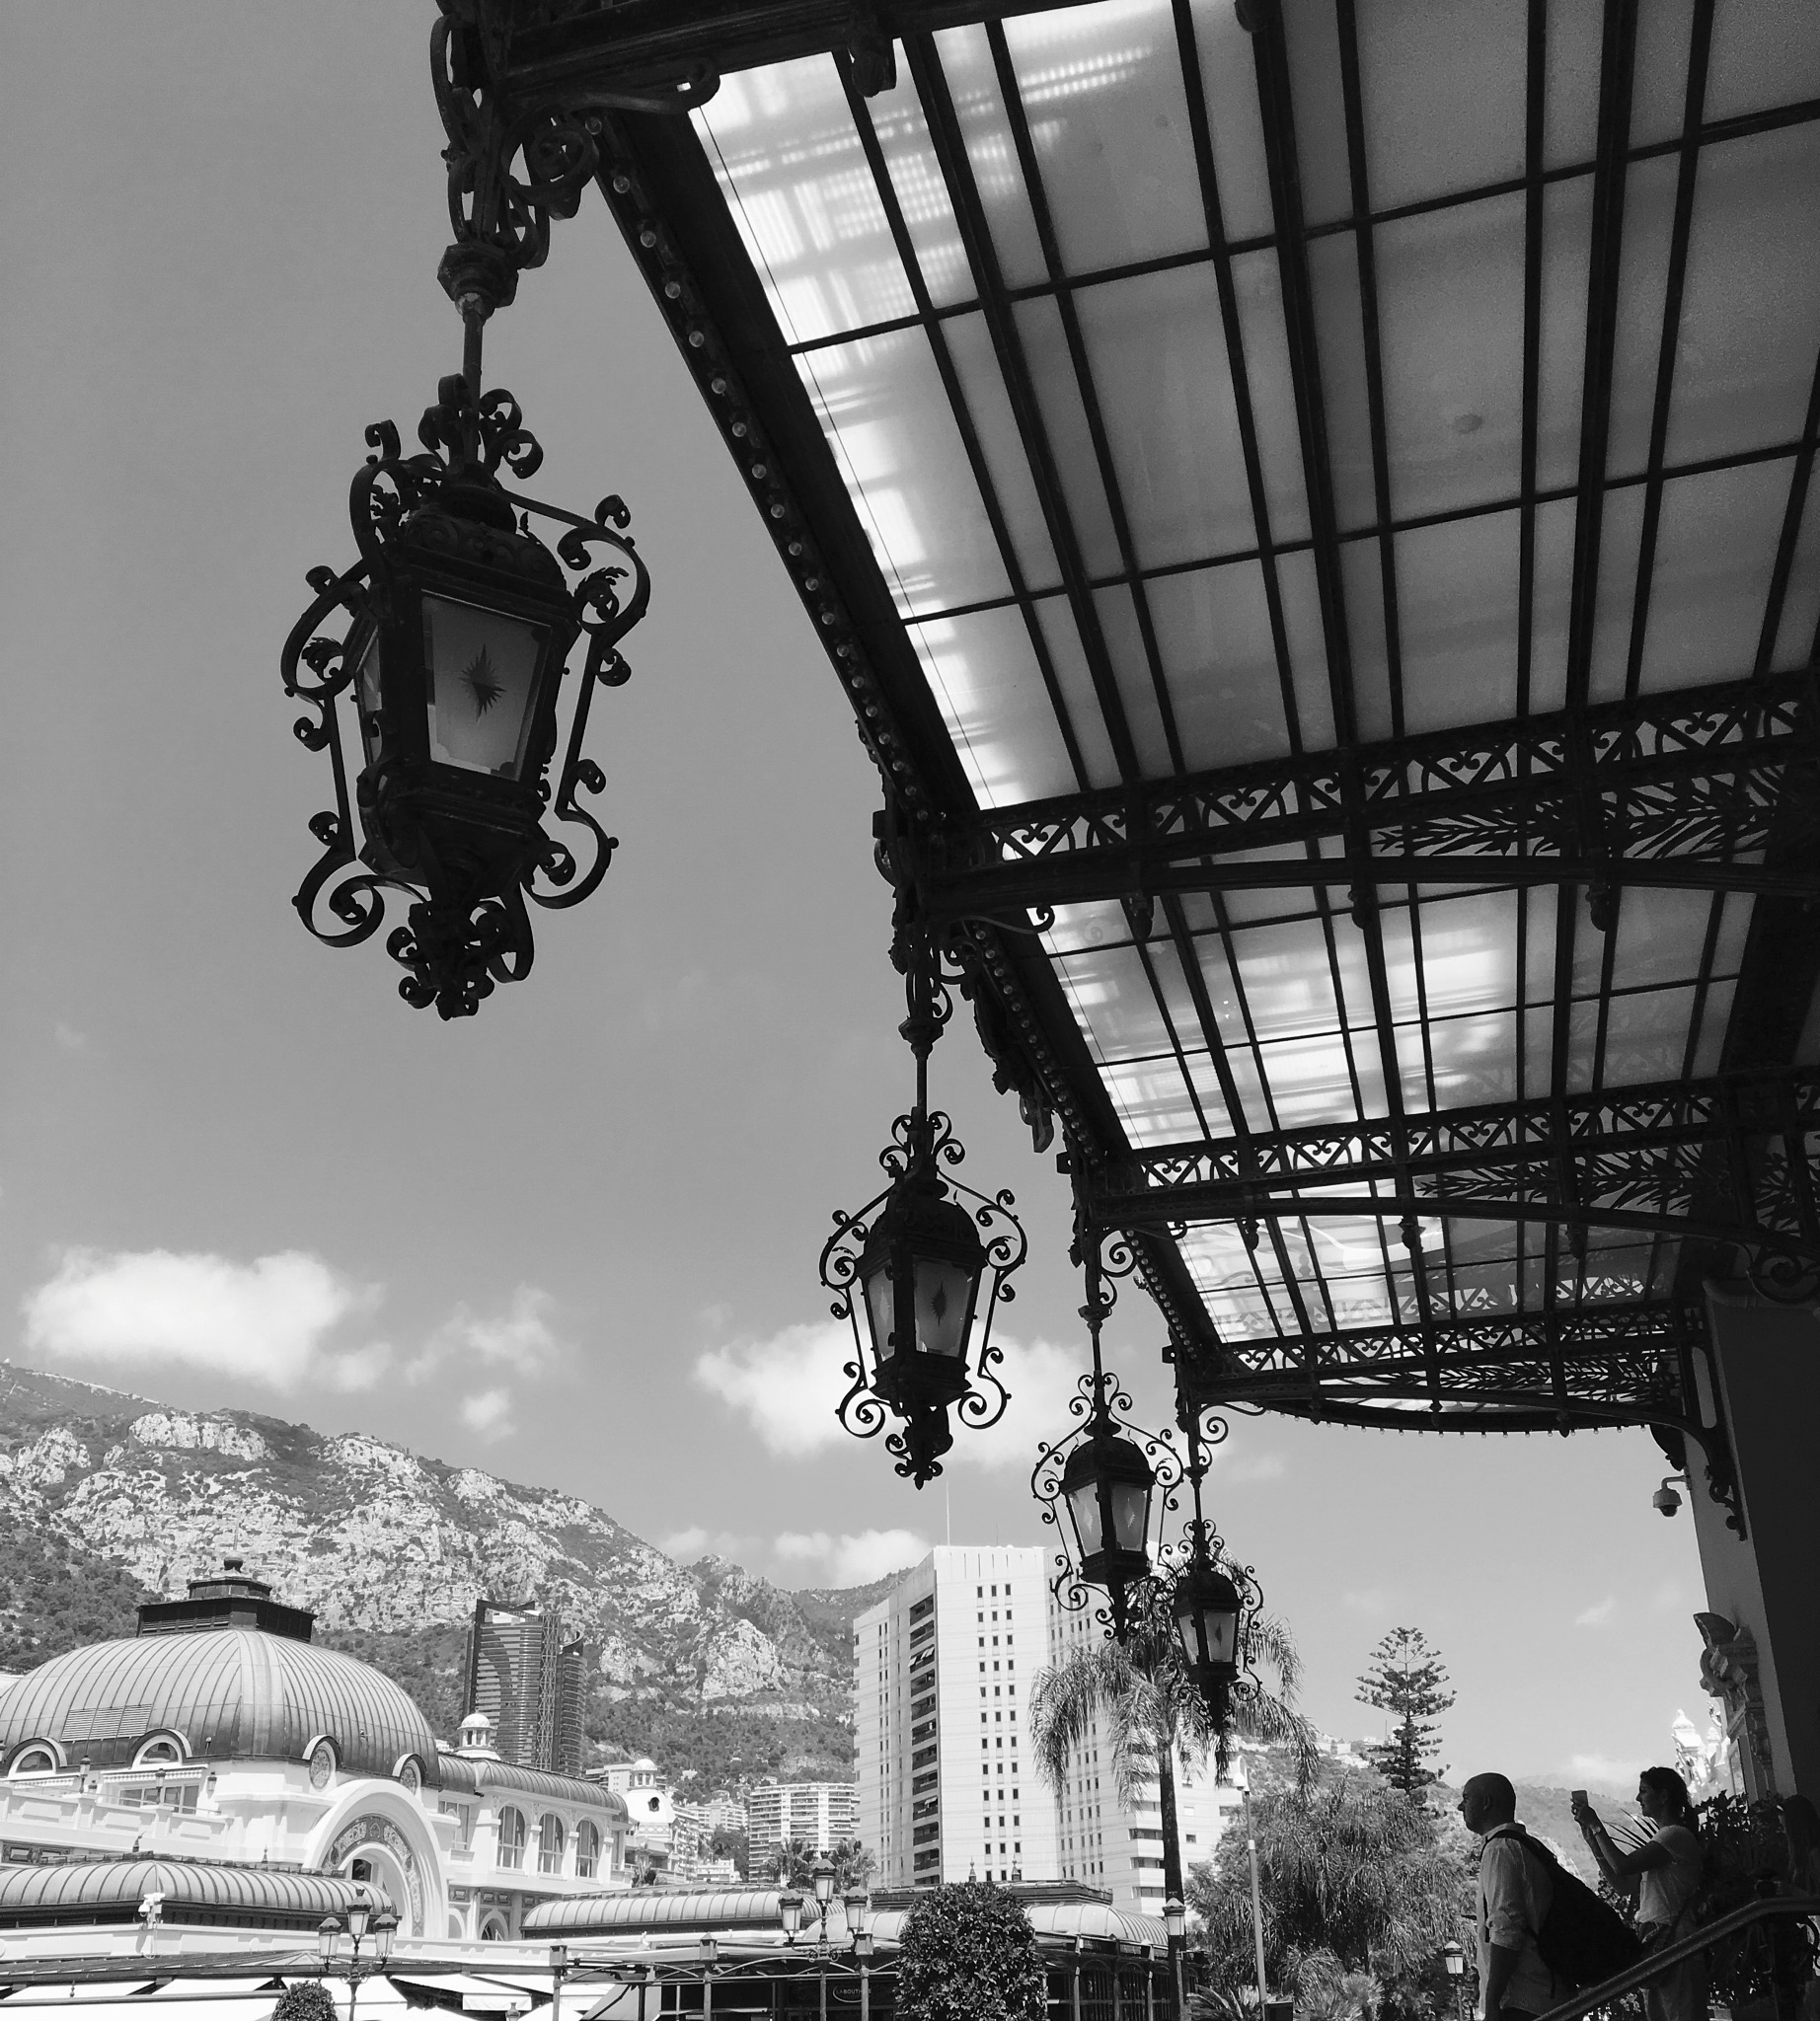 Montecarlo by ceciliacarcamo